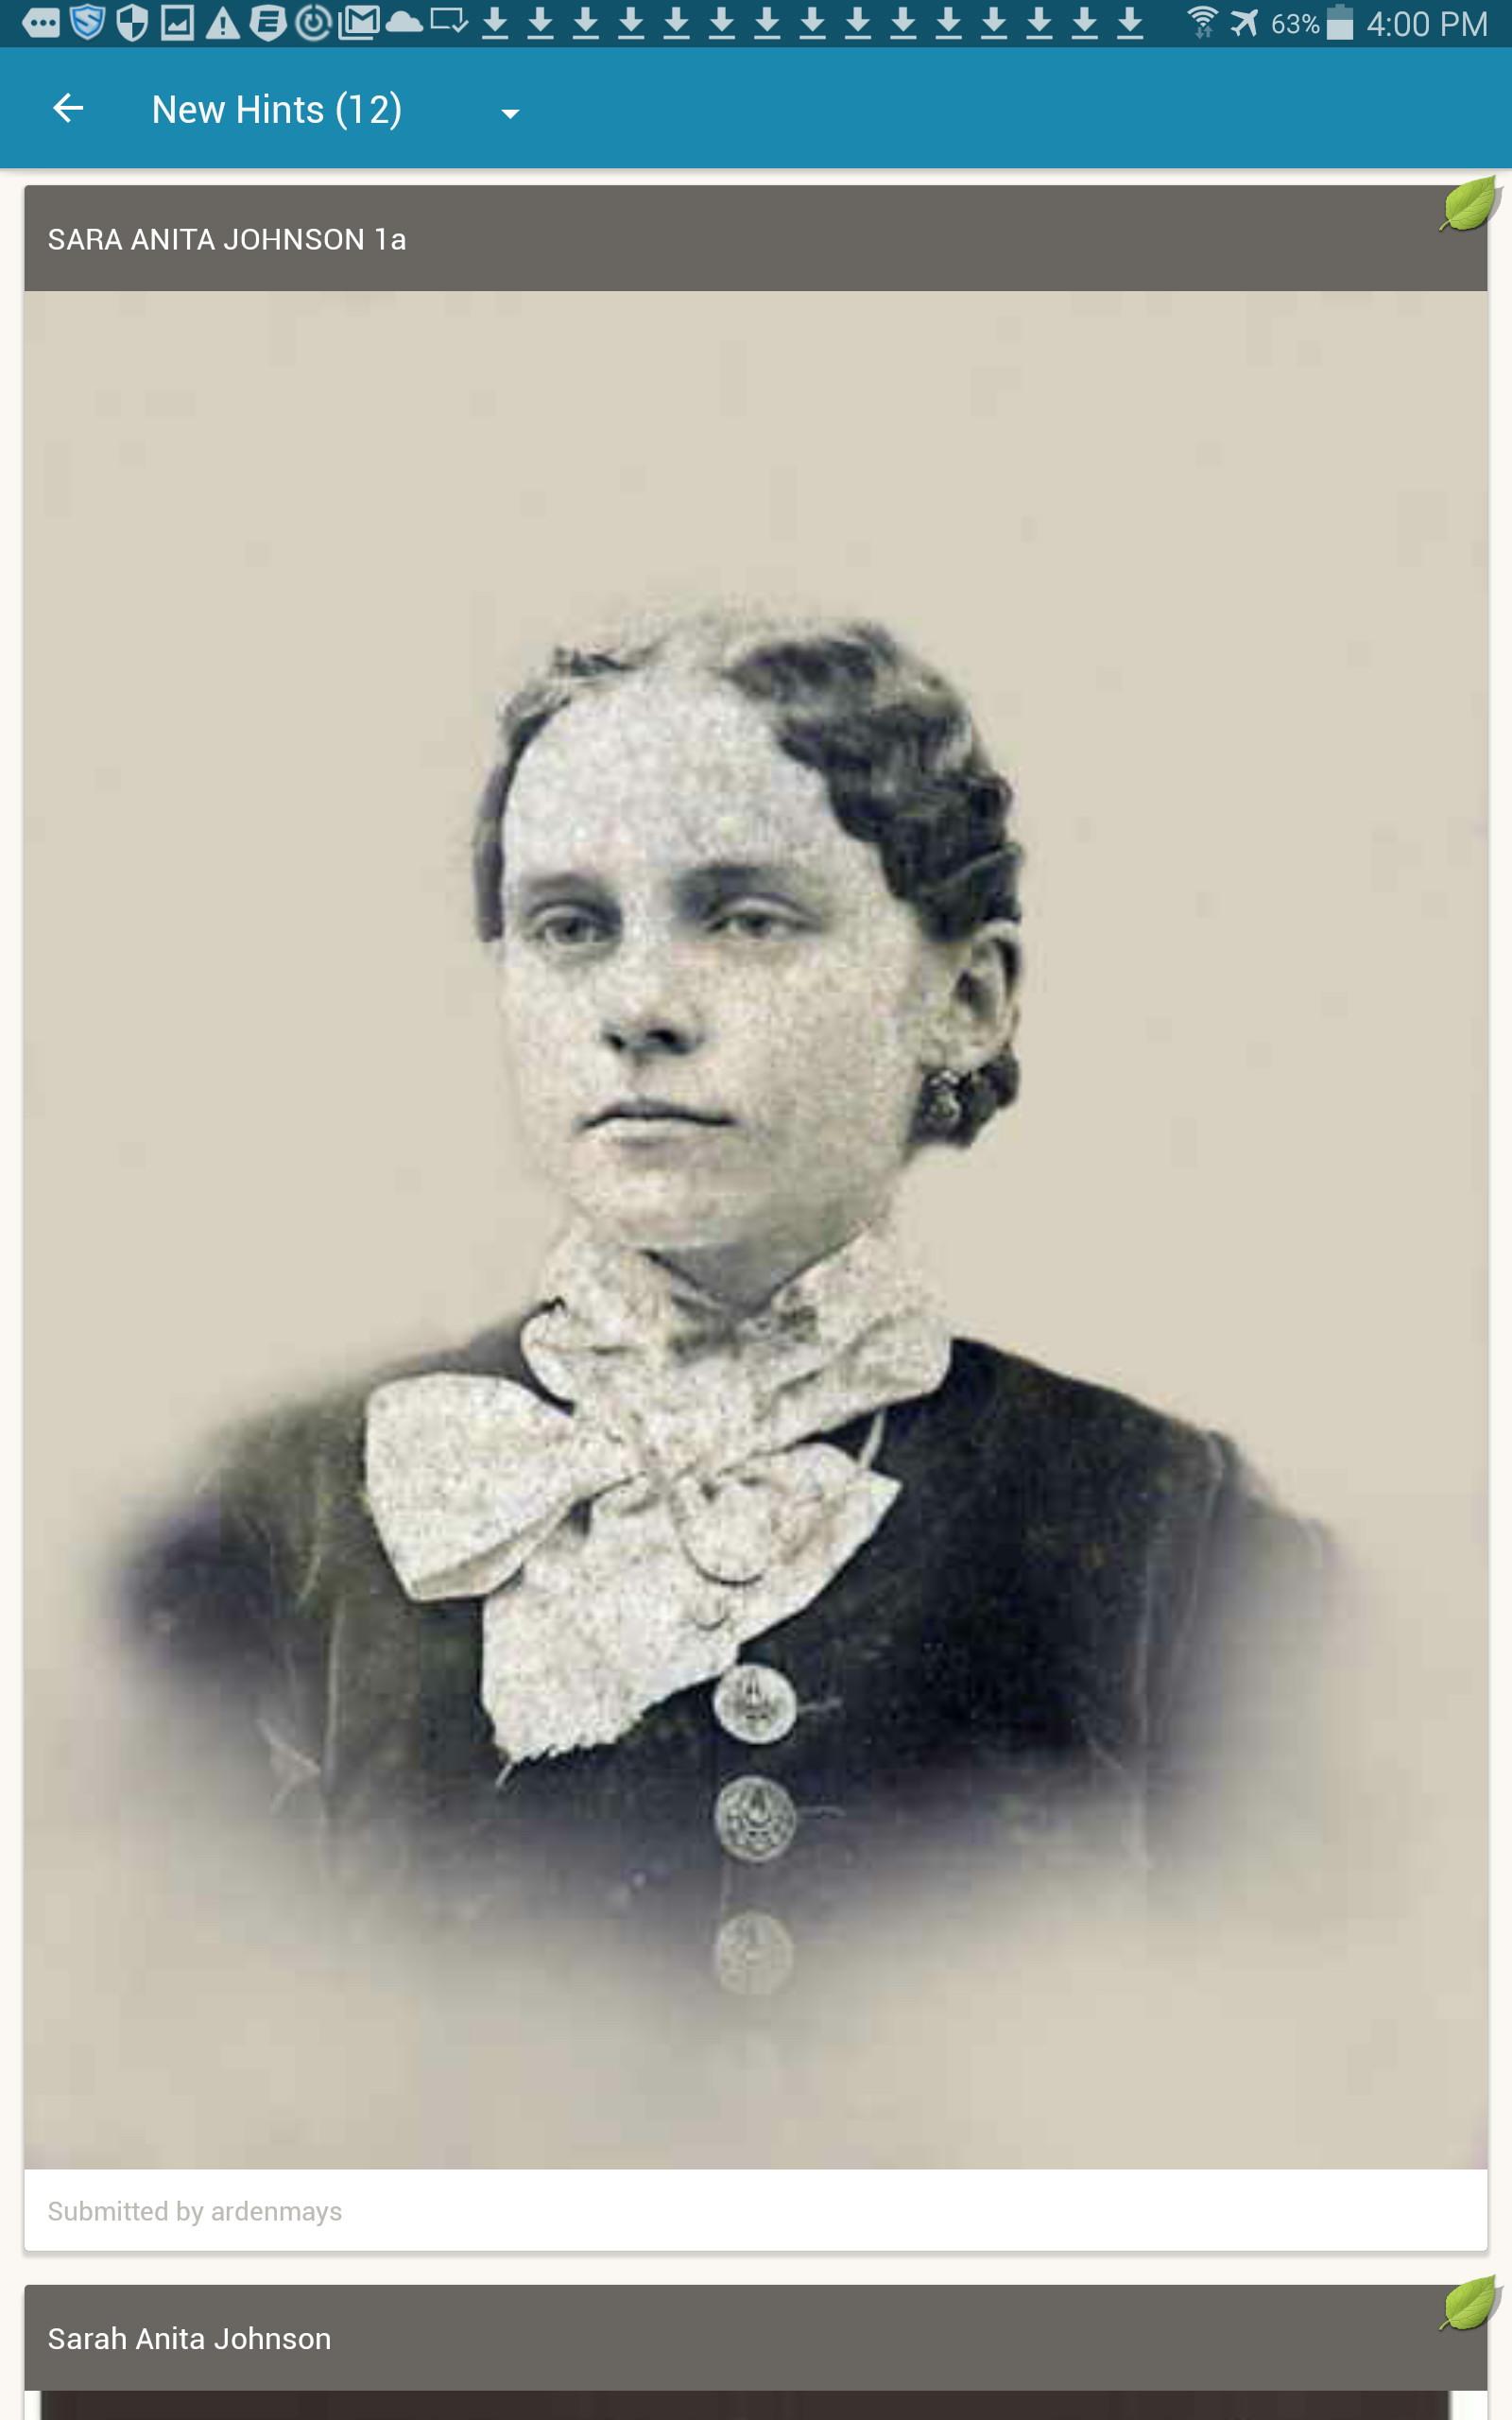 Anita Darlene Johnson